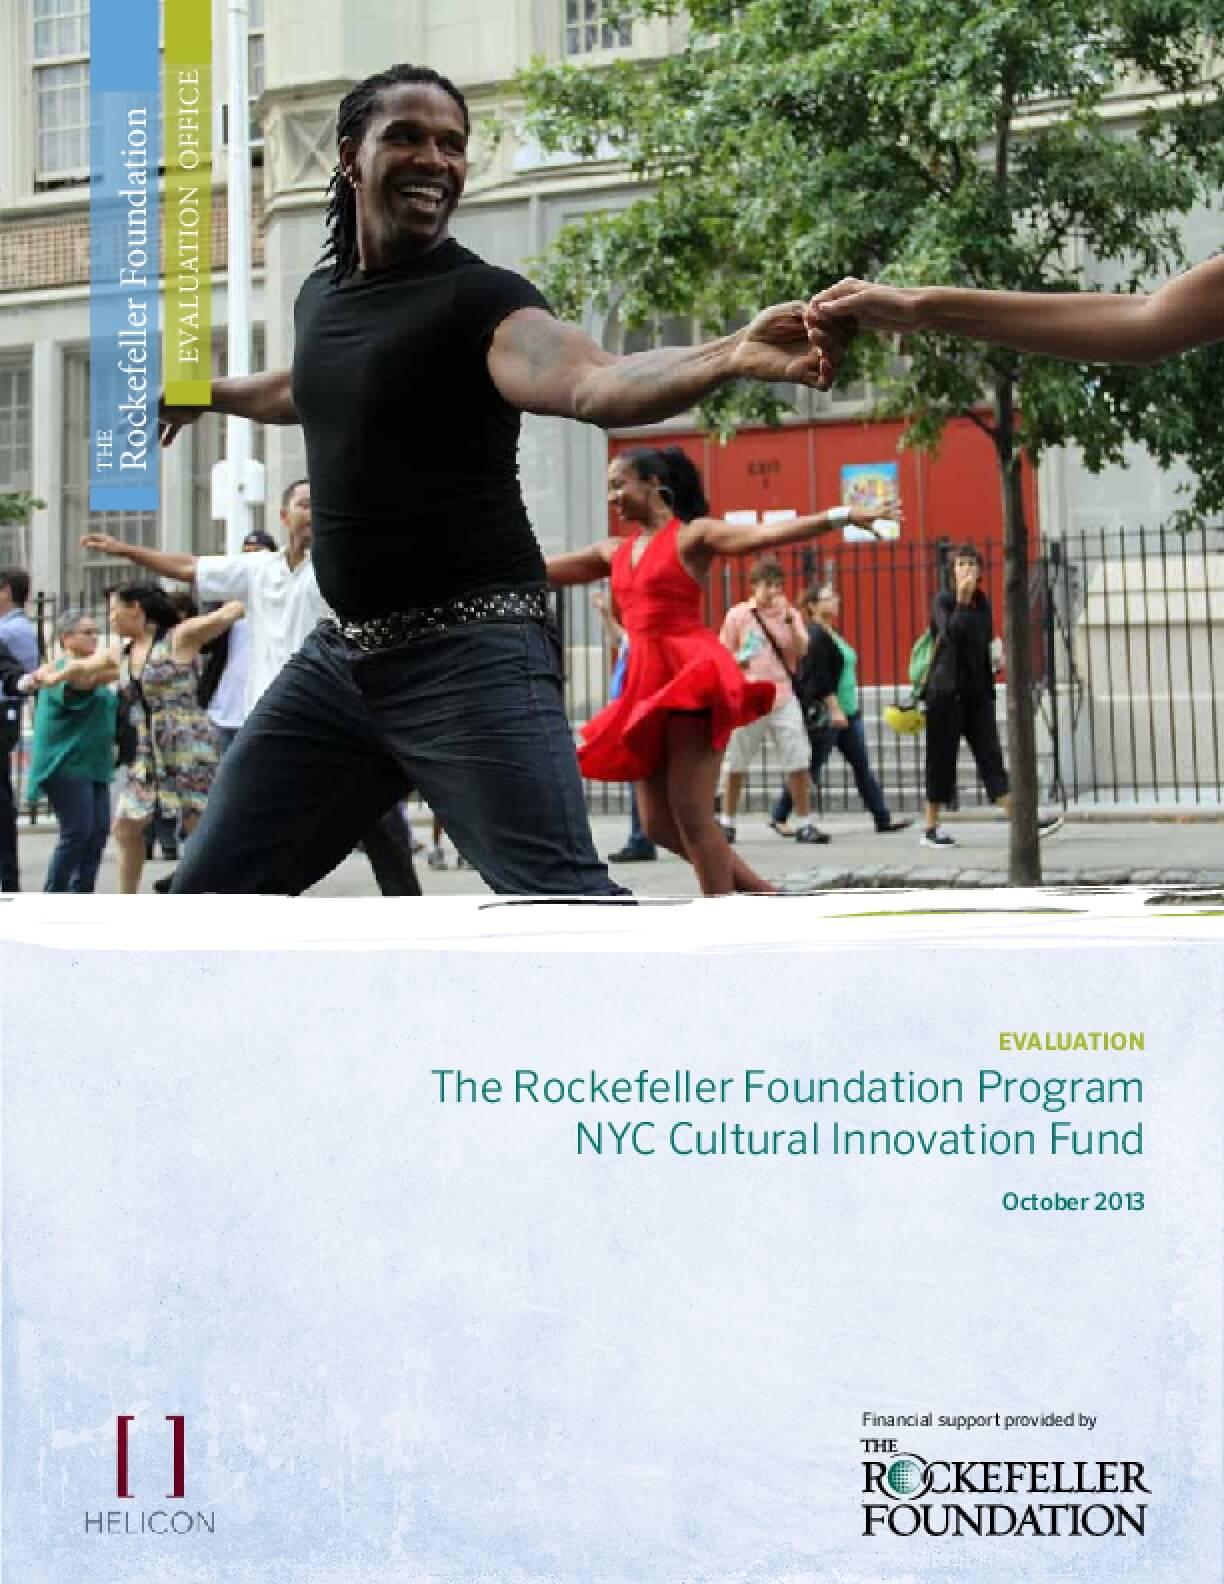 The Rockefeller Foundation Program NYC Cultural Innovation Fund: Evaluation